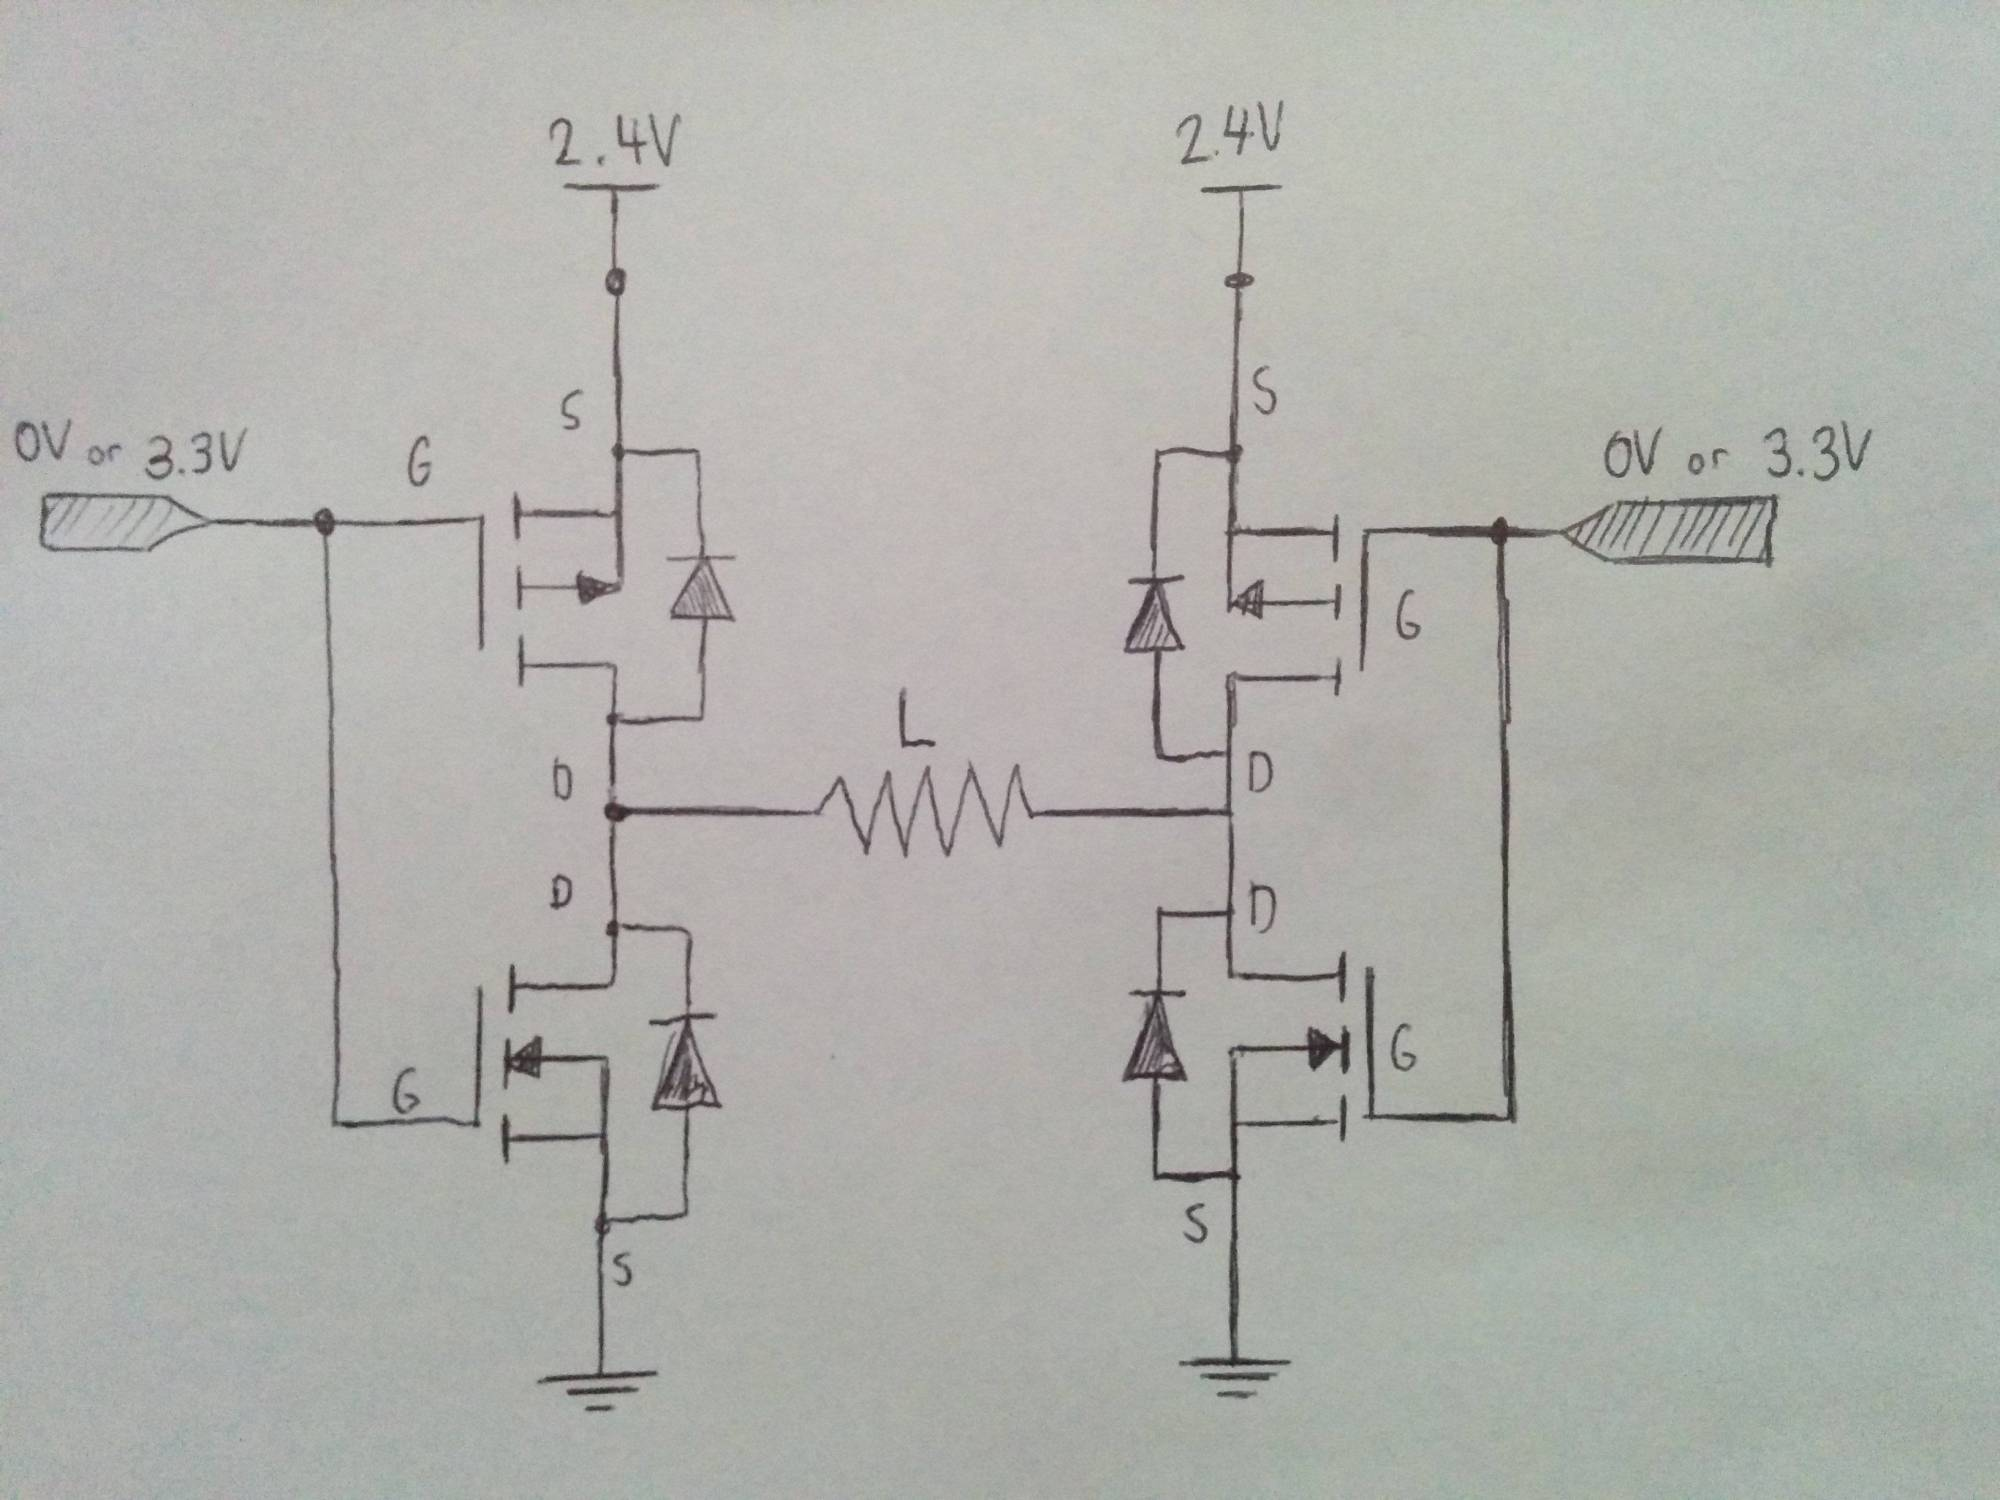 hight resolution of original h bridge circuit